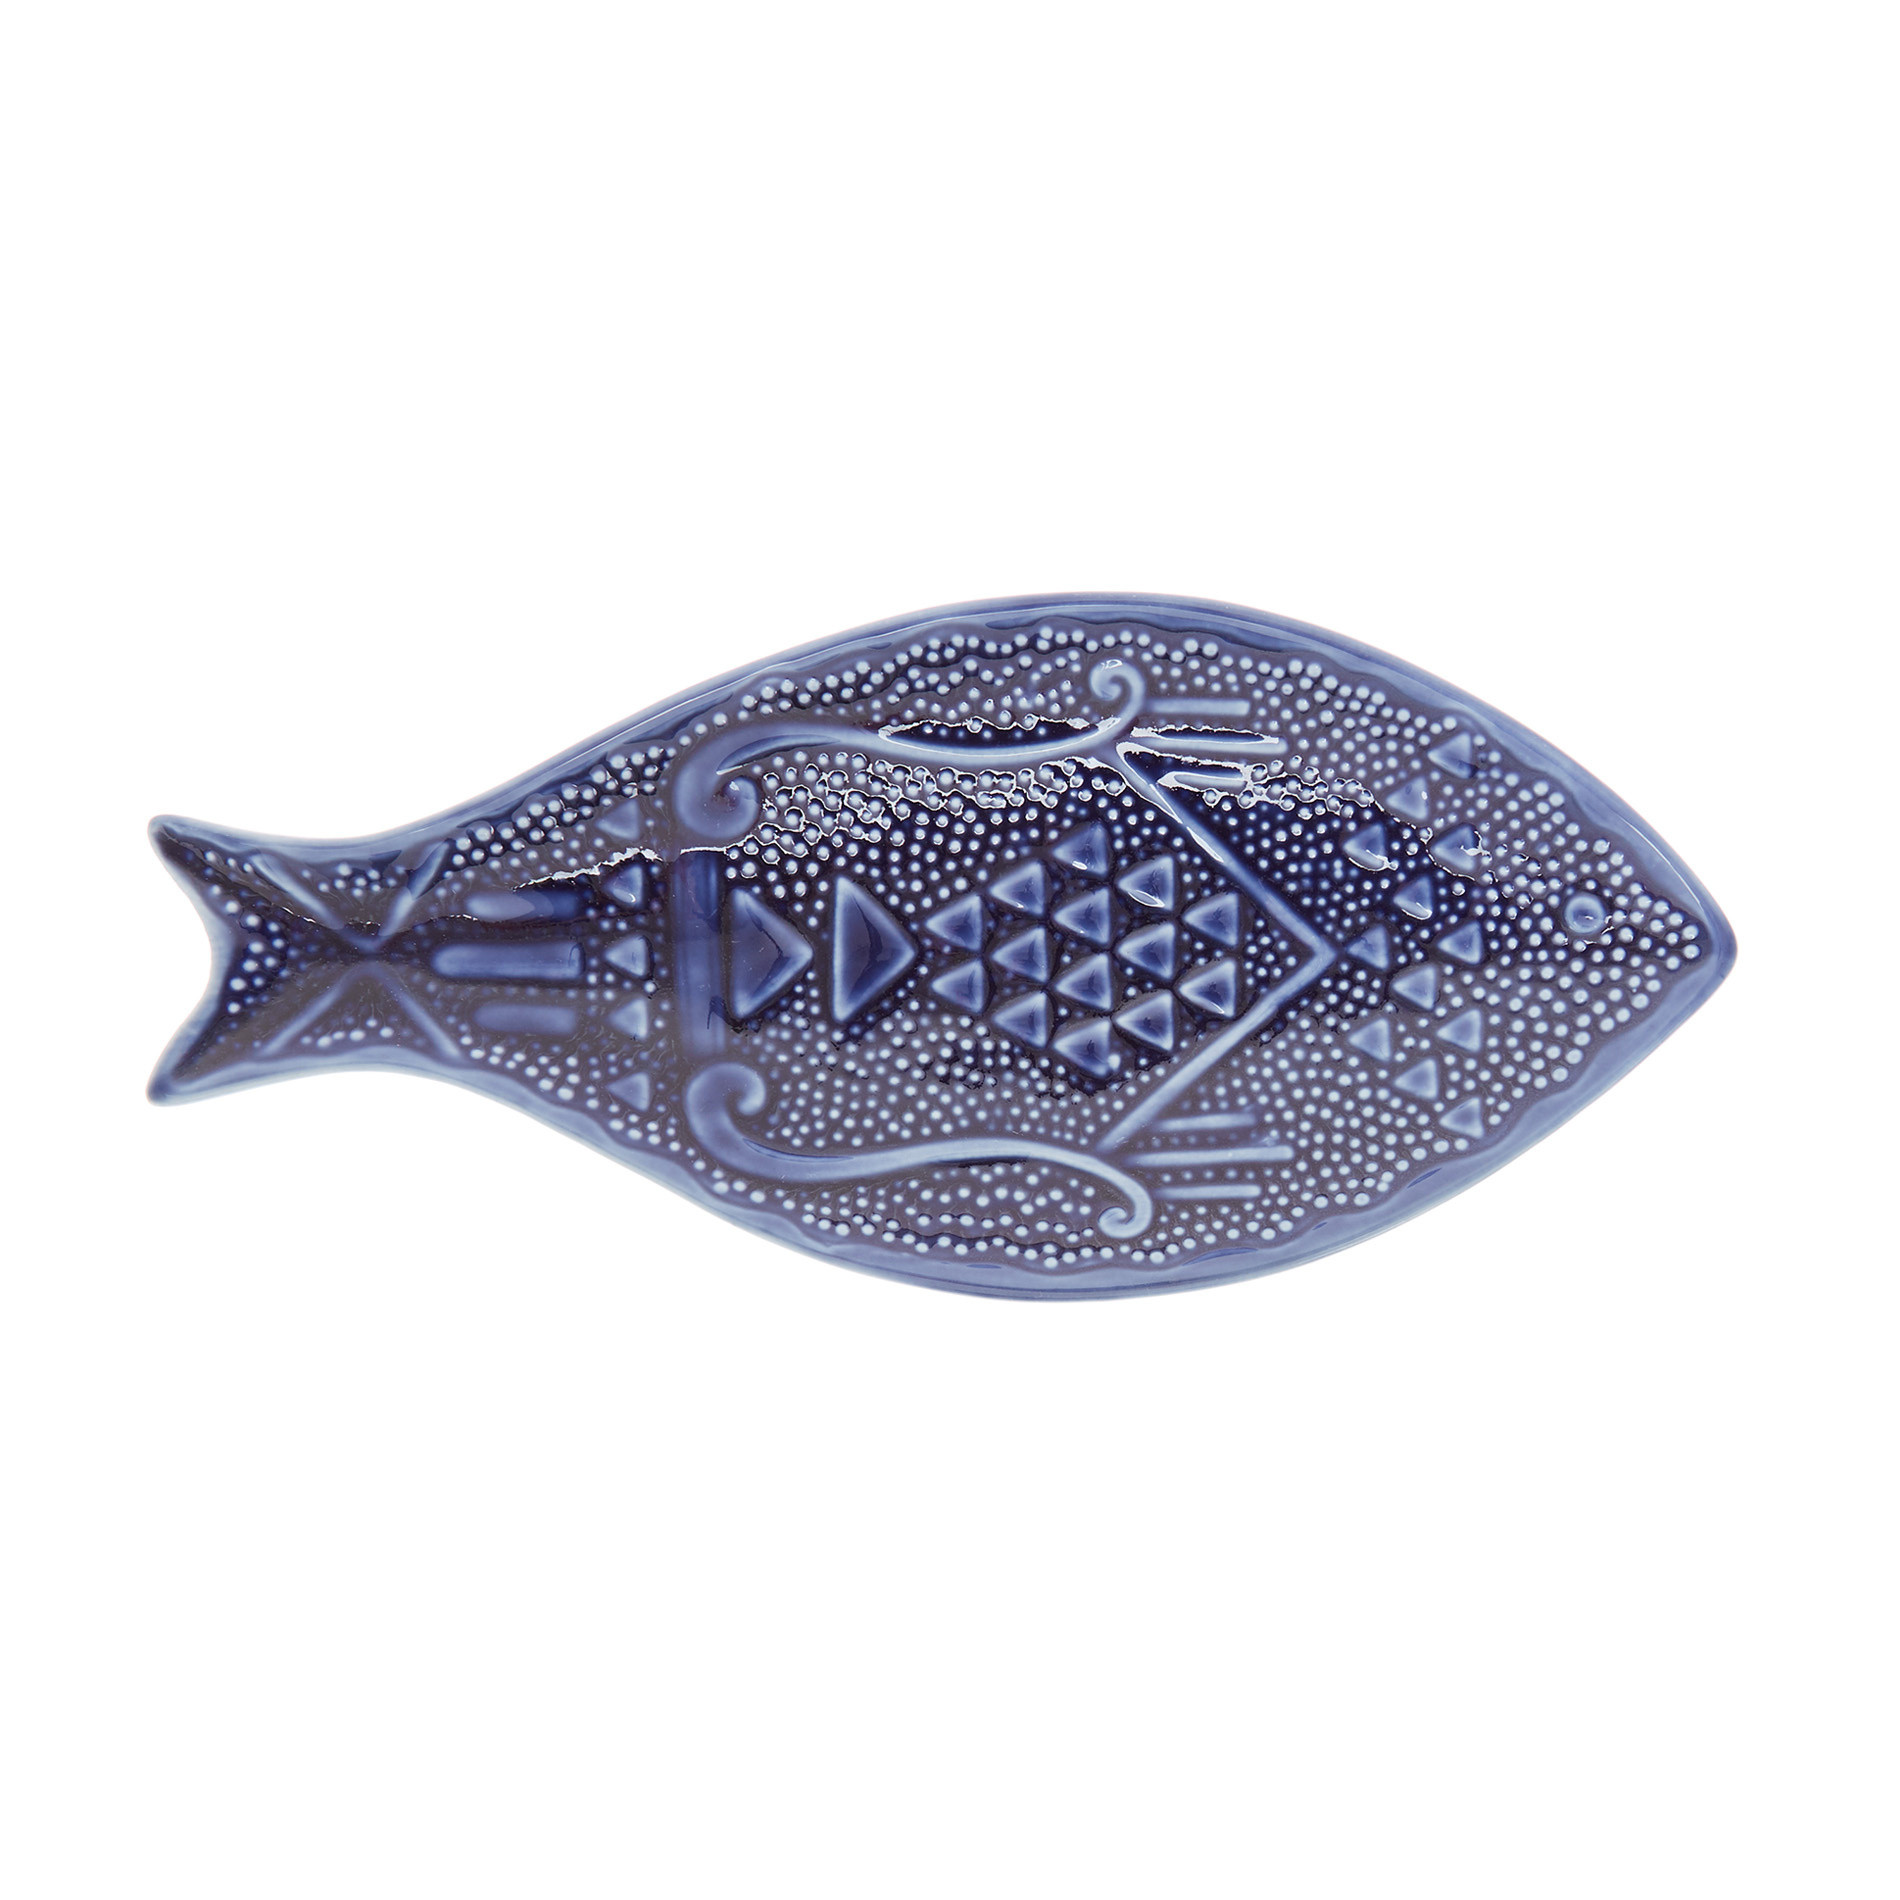 Piatto porcellana a pesce, Blu, large image number 0